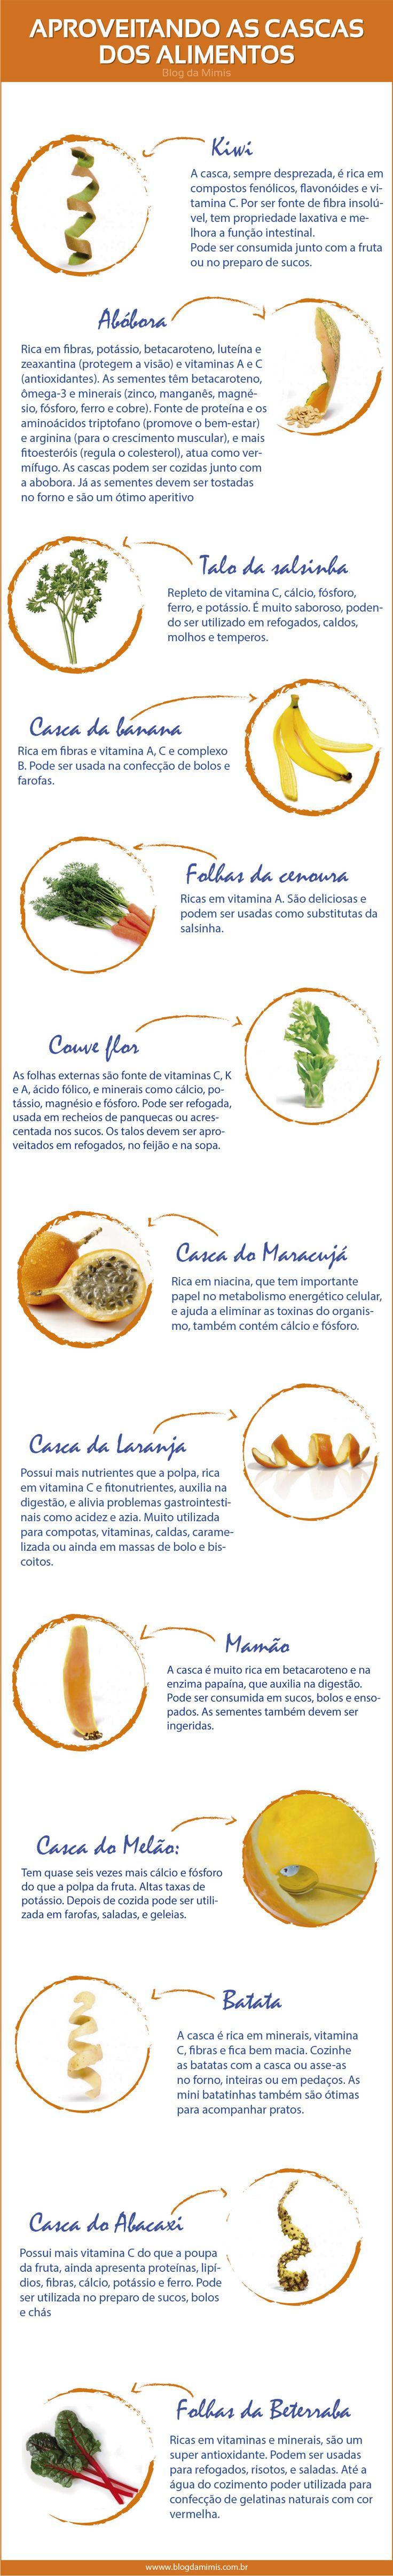 cascas-alimentos-post-blog-da-mimis-michelli-franzoni